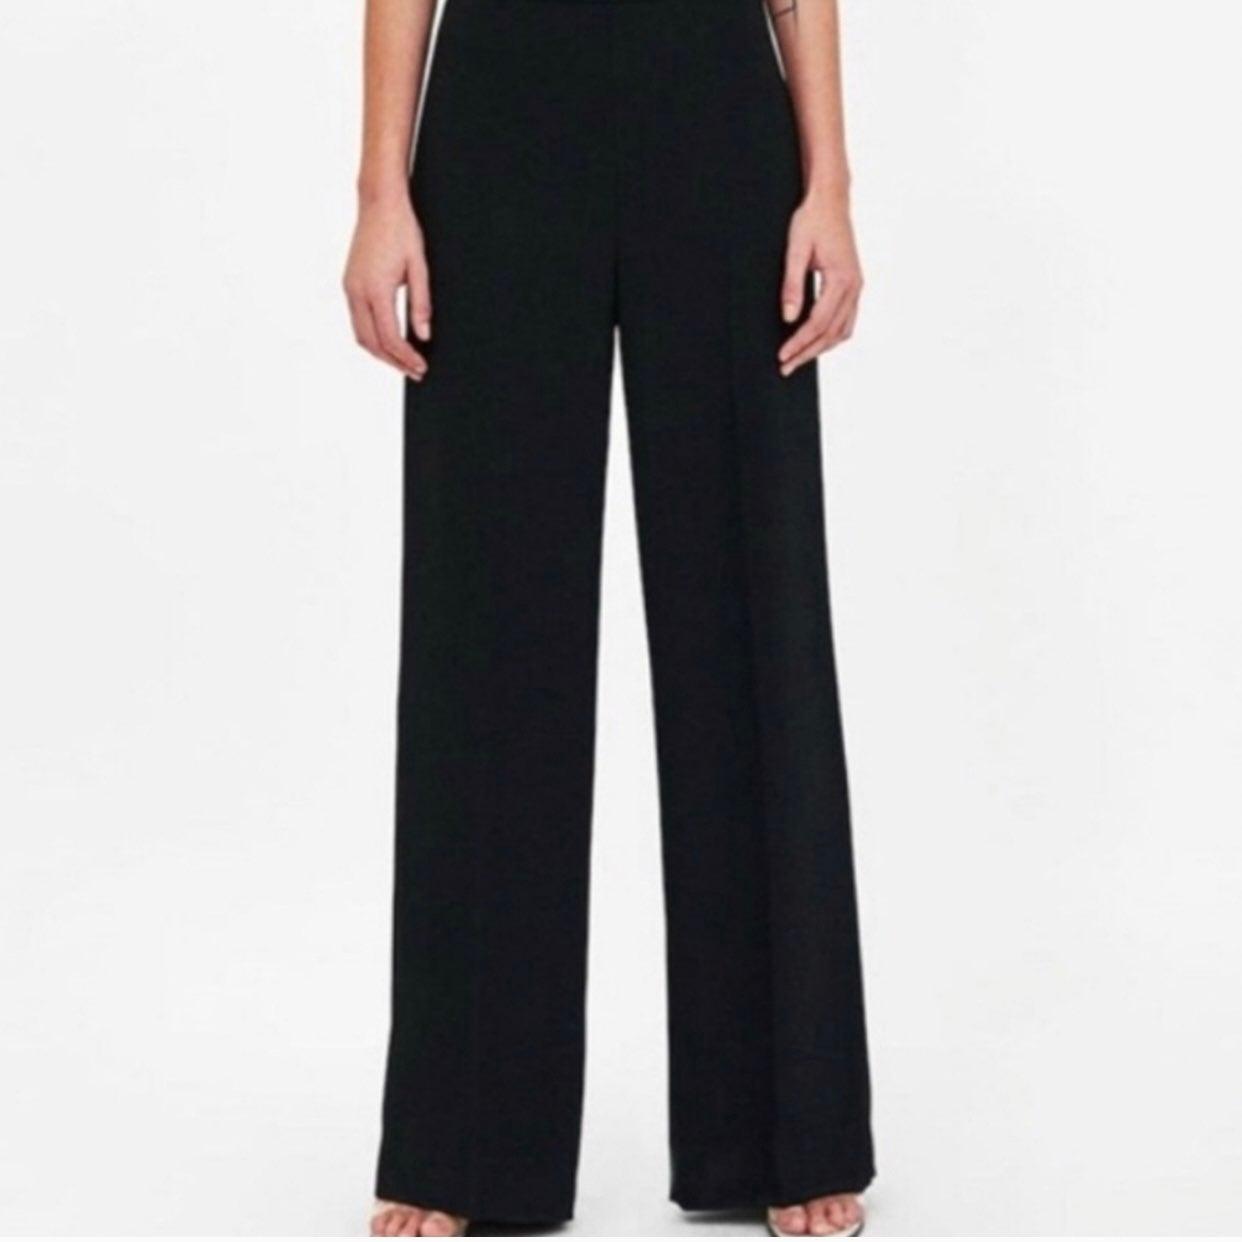 Zara Black Lightweight Flare Business Ca